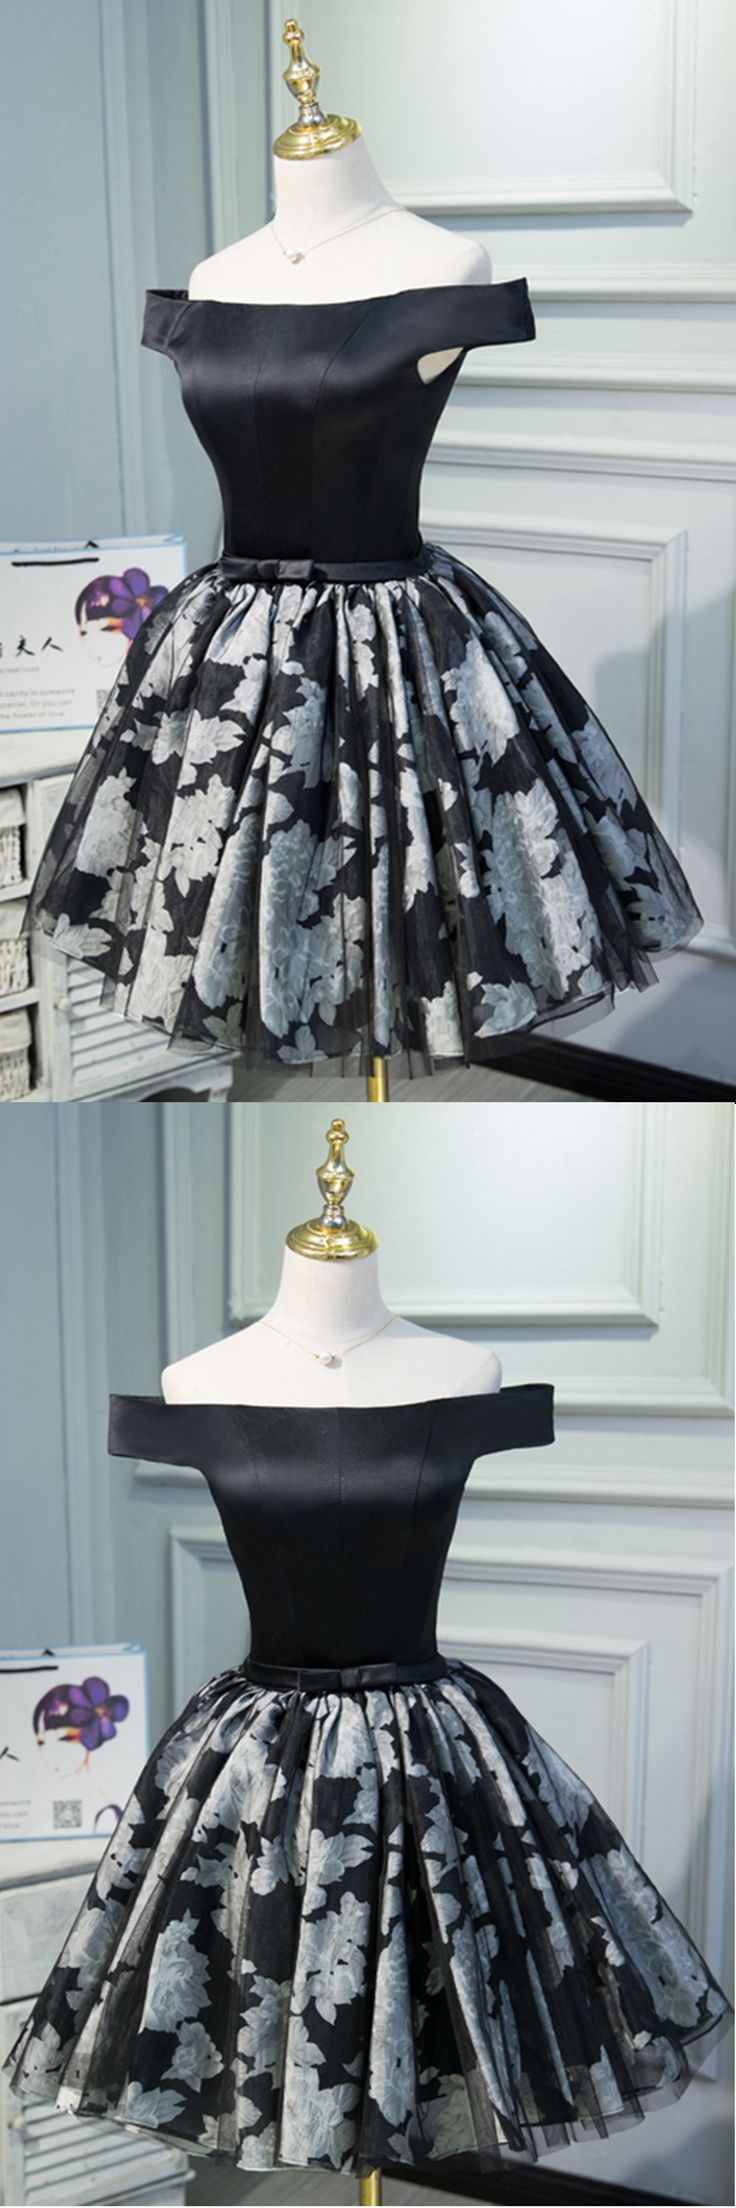 Cute off shoulder mini black dress with bowknot, mini black party dress